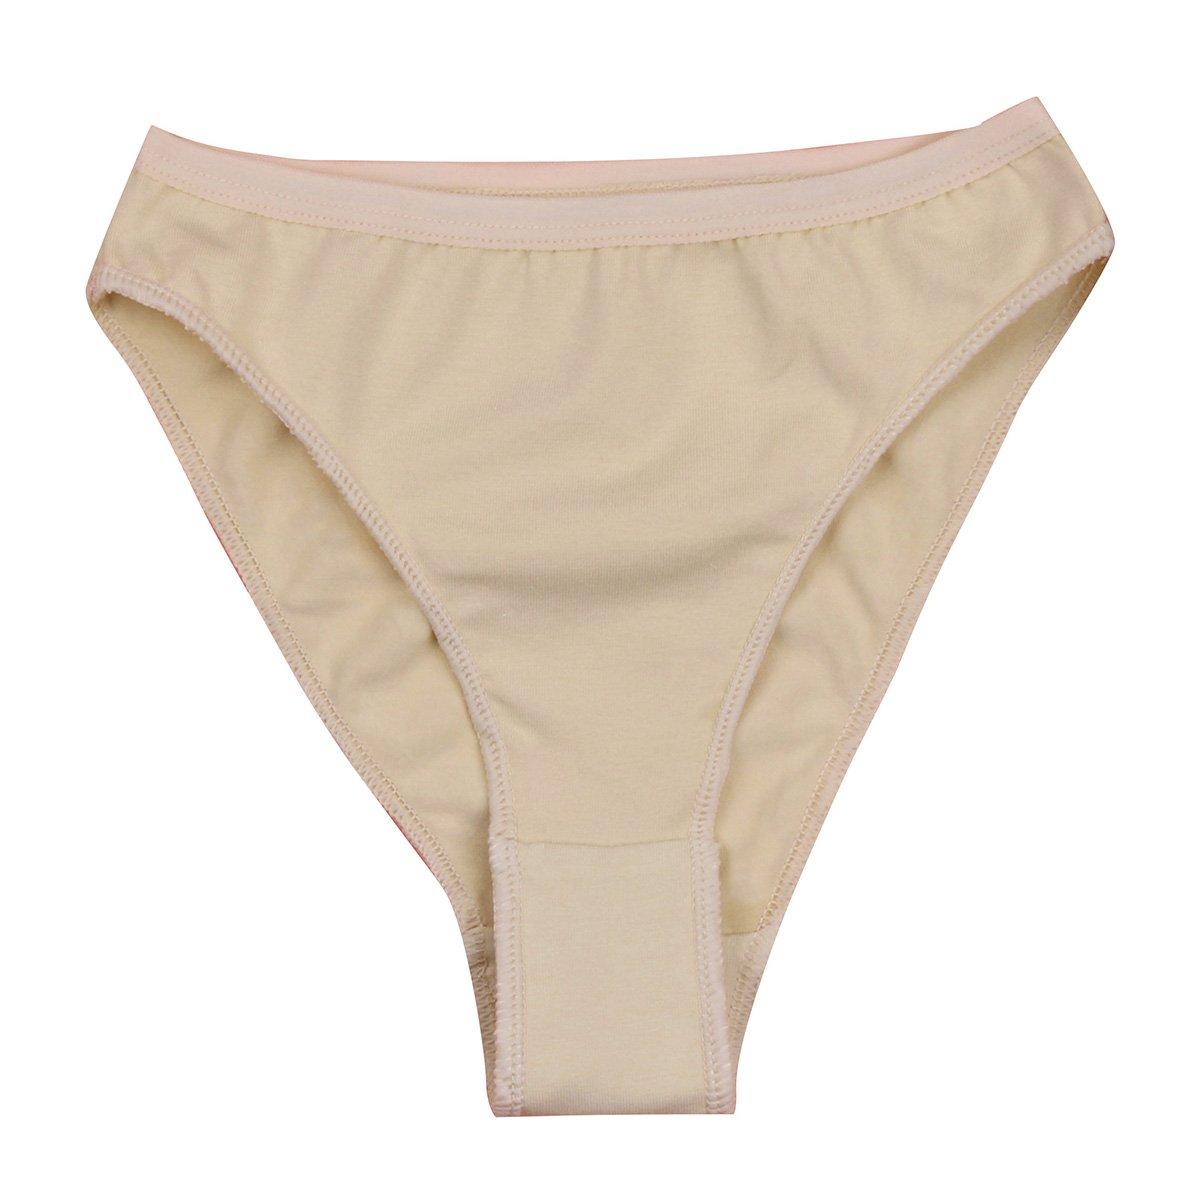 dPois Kids Girls' High Cut Gymnastics Workout Briefs Shorts Underwear Athletic Underpants Nude 2-3